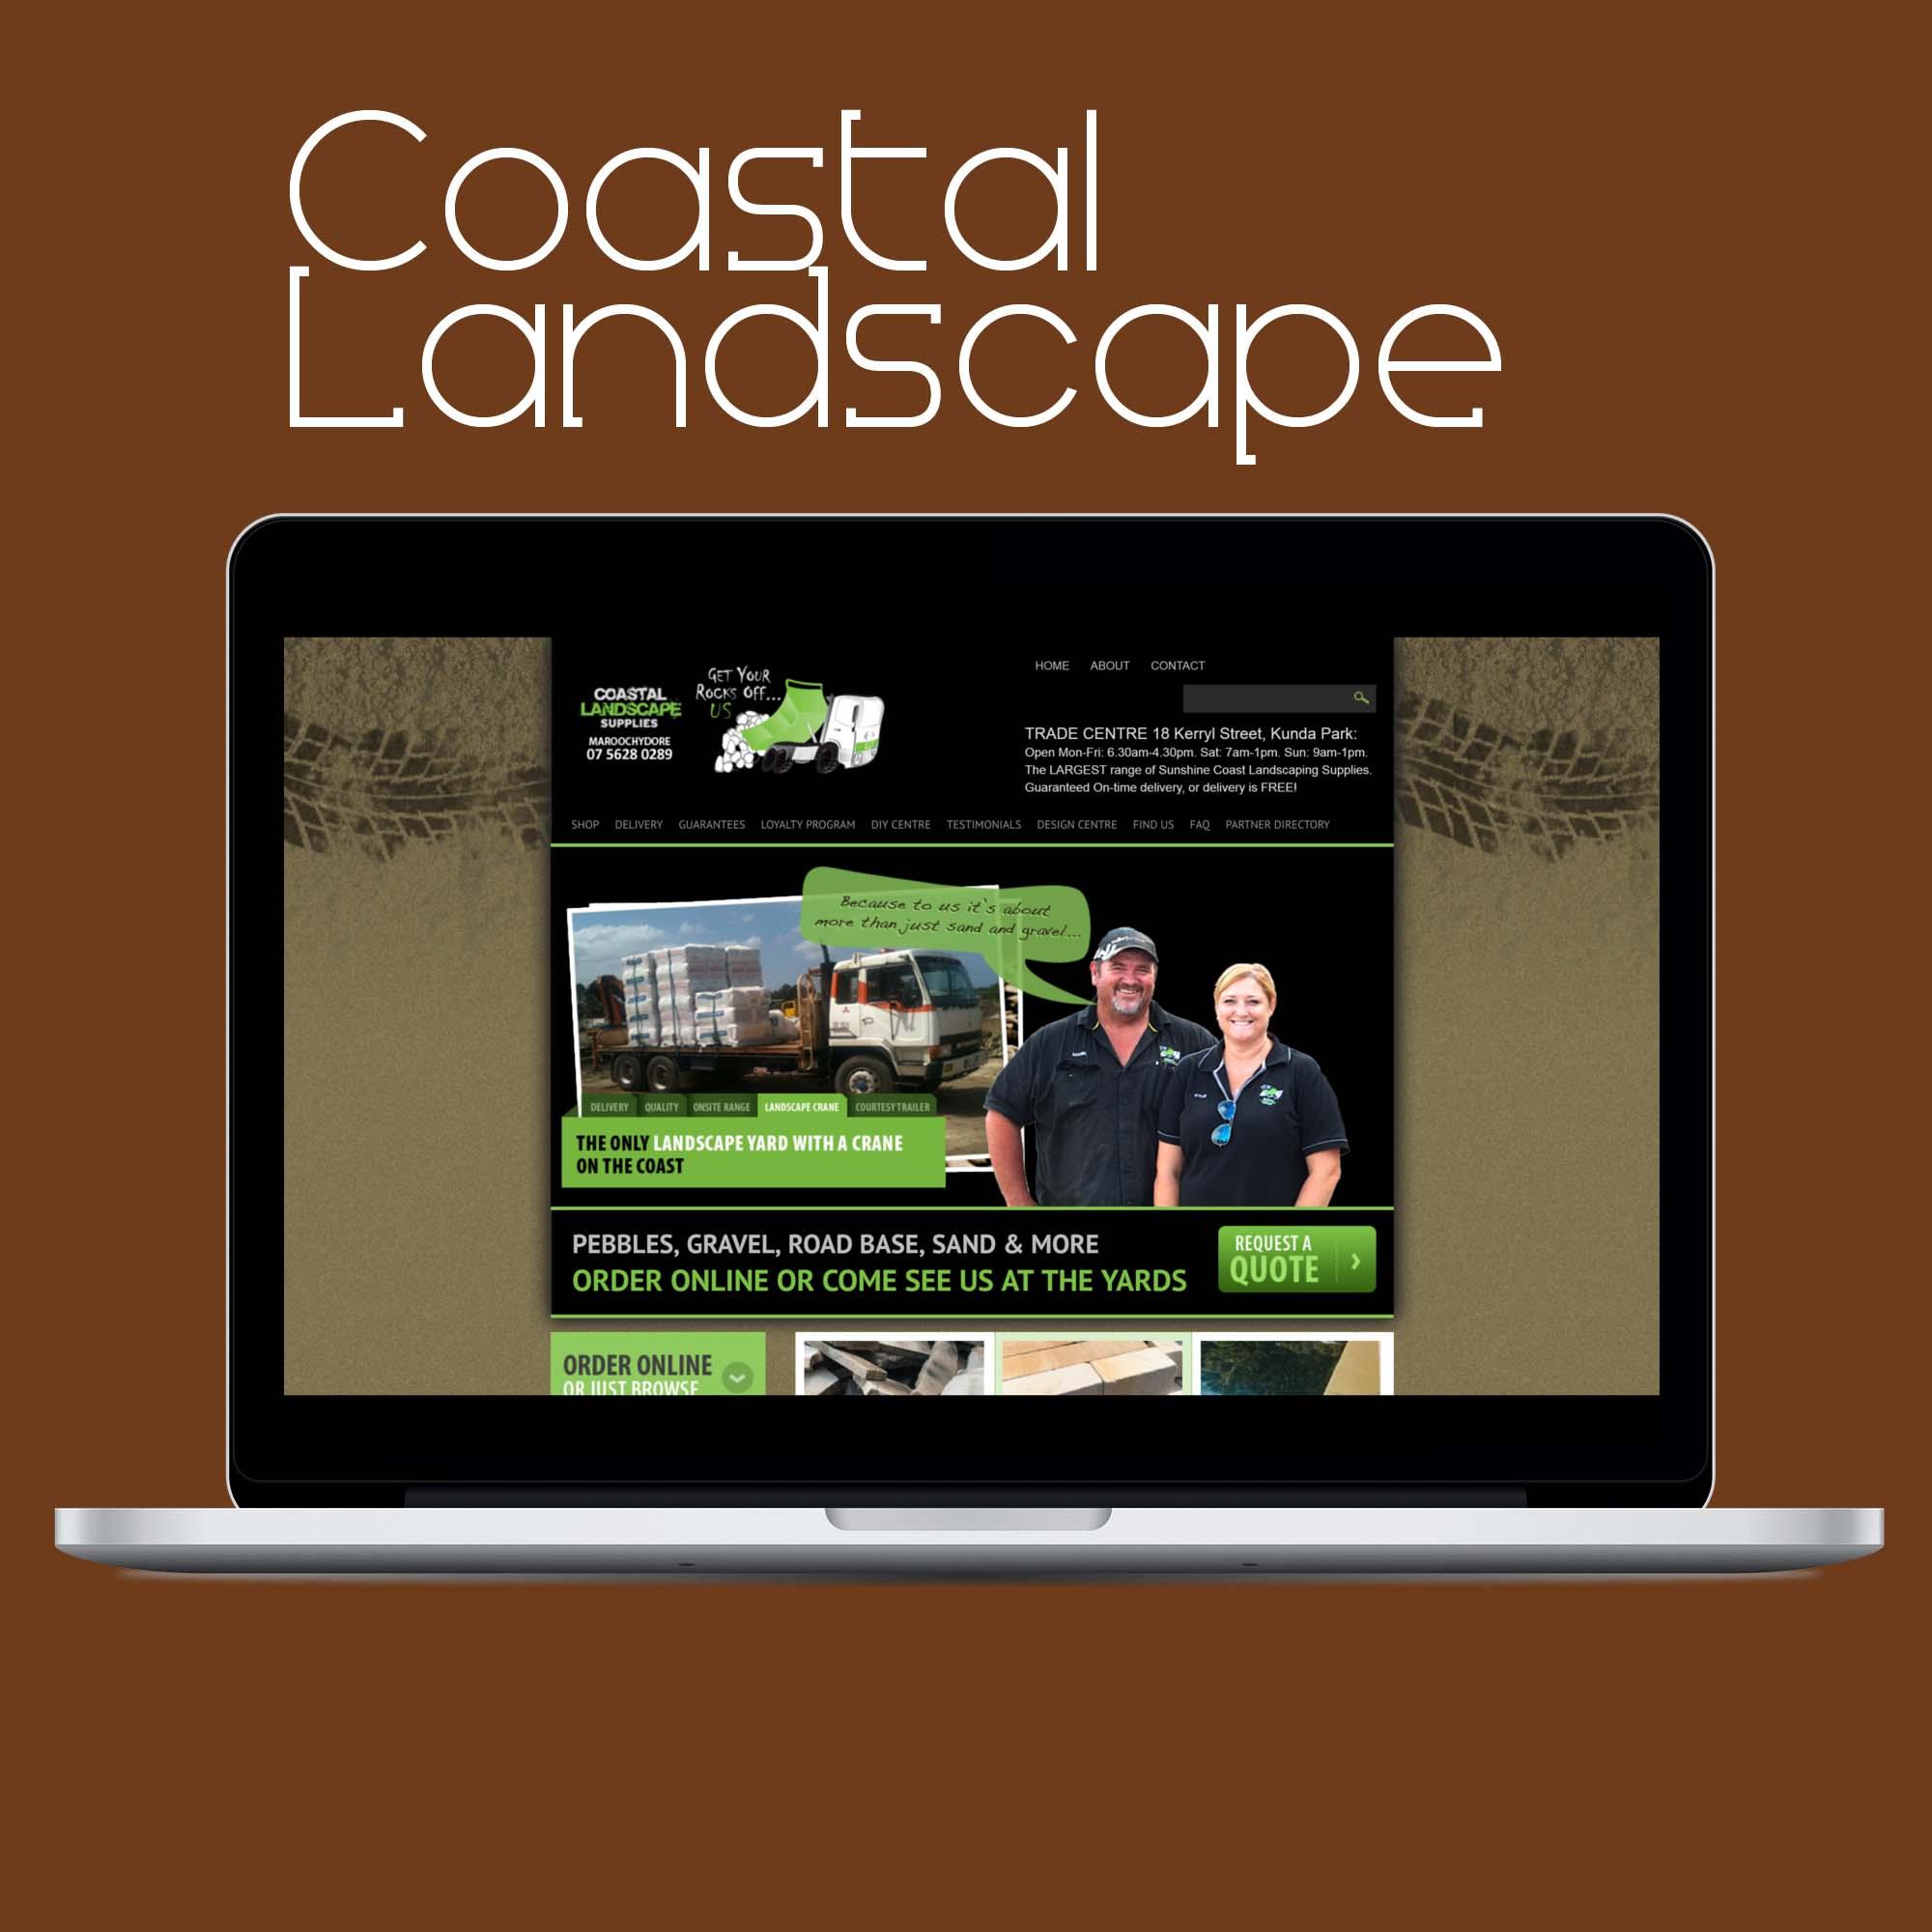 www.coastallandscape.com